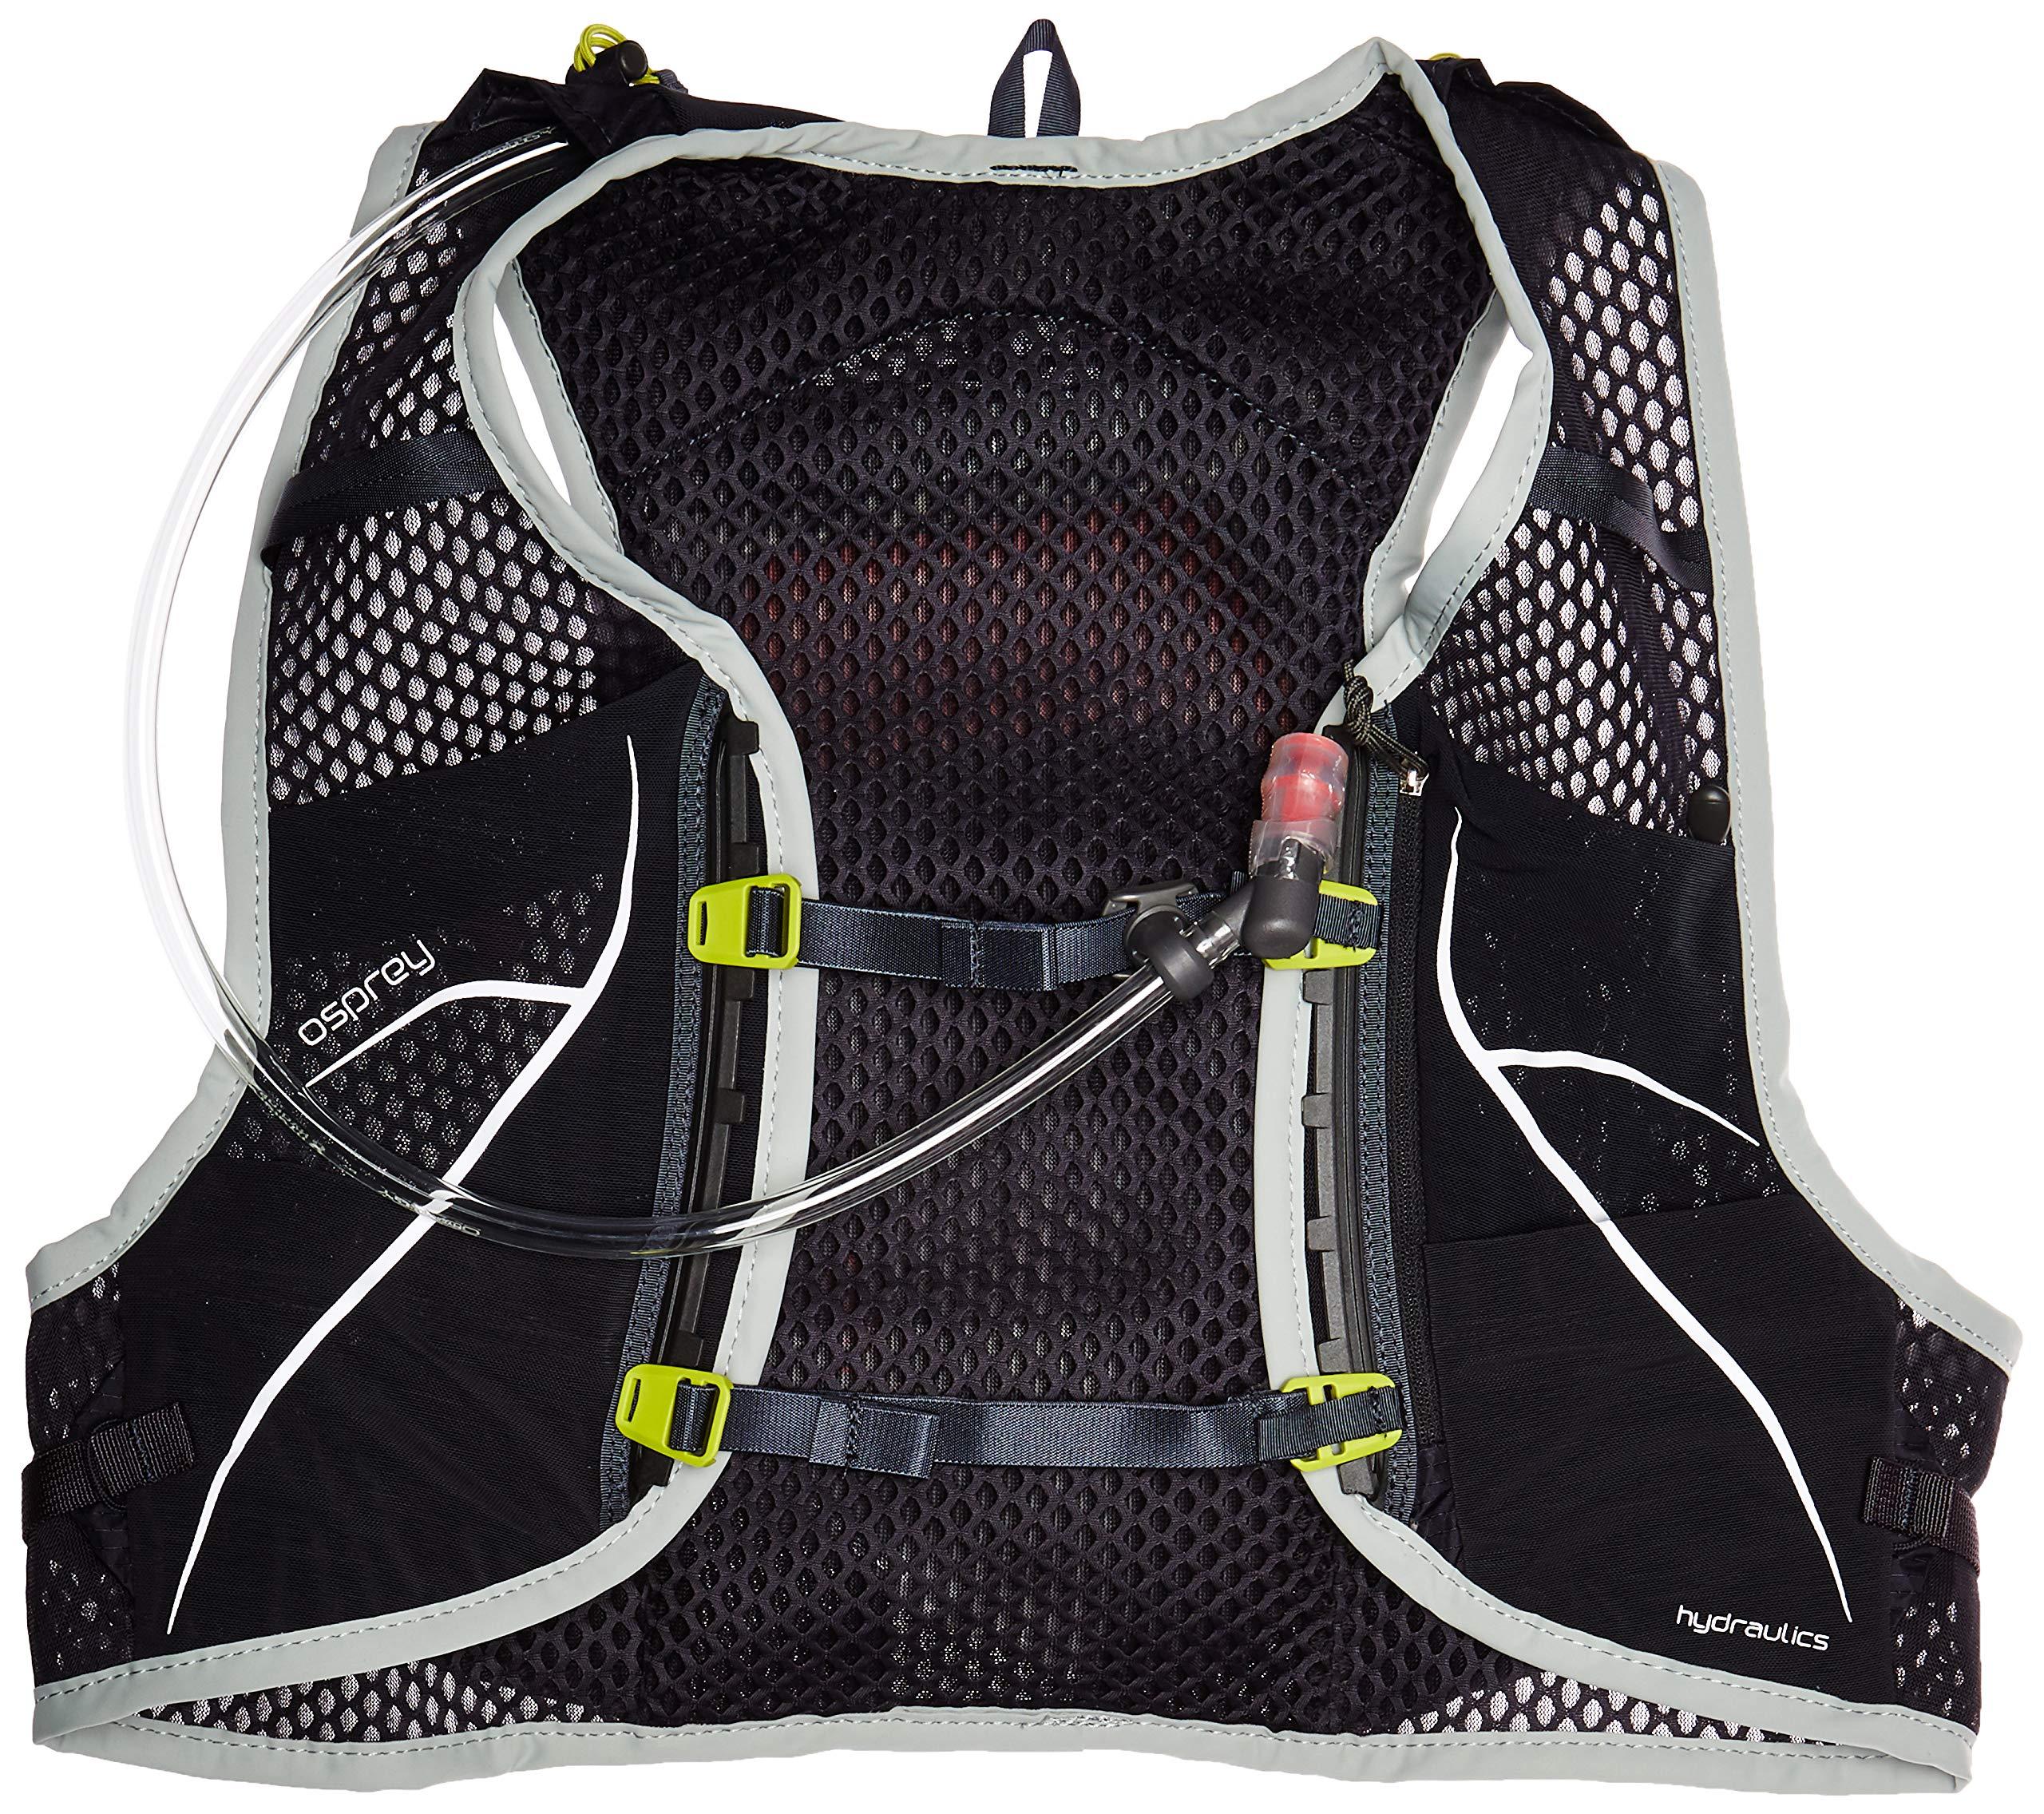 Osprey Packs Duro 1.5L Running Hydration Vest, Alpine Black, Small/Medium, S/M by Osprey